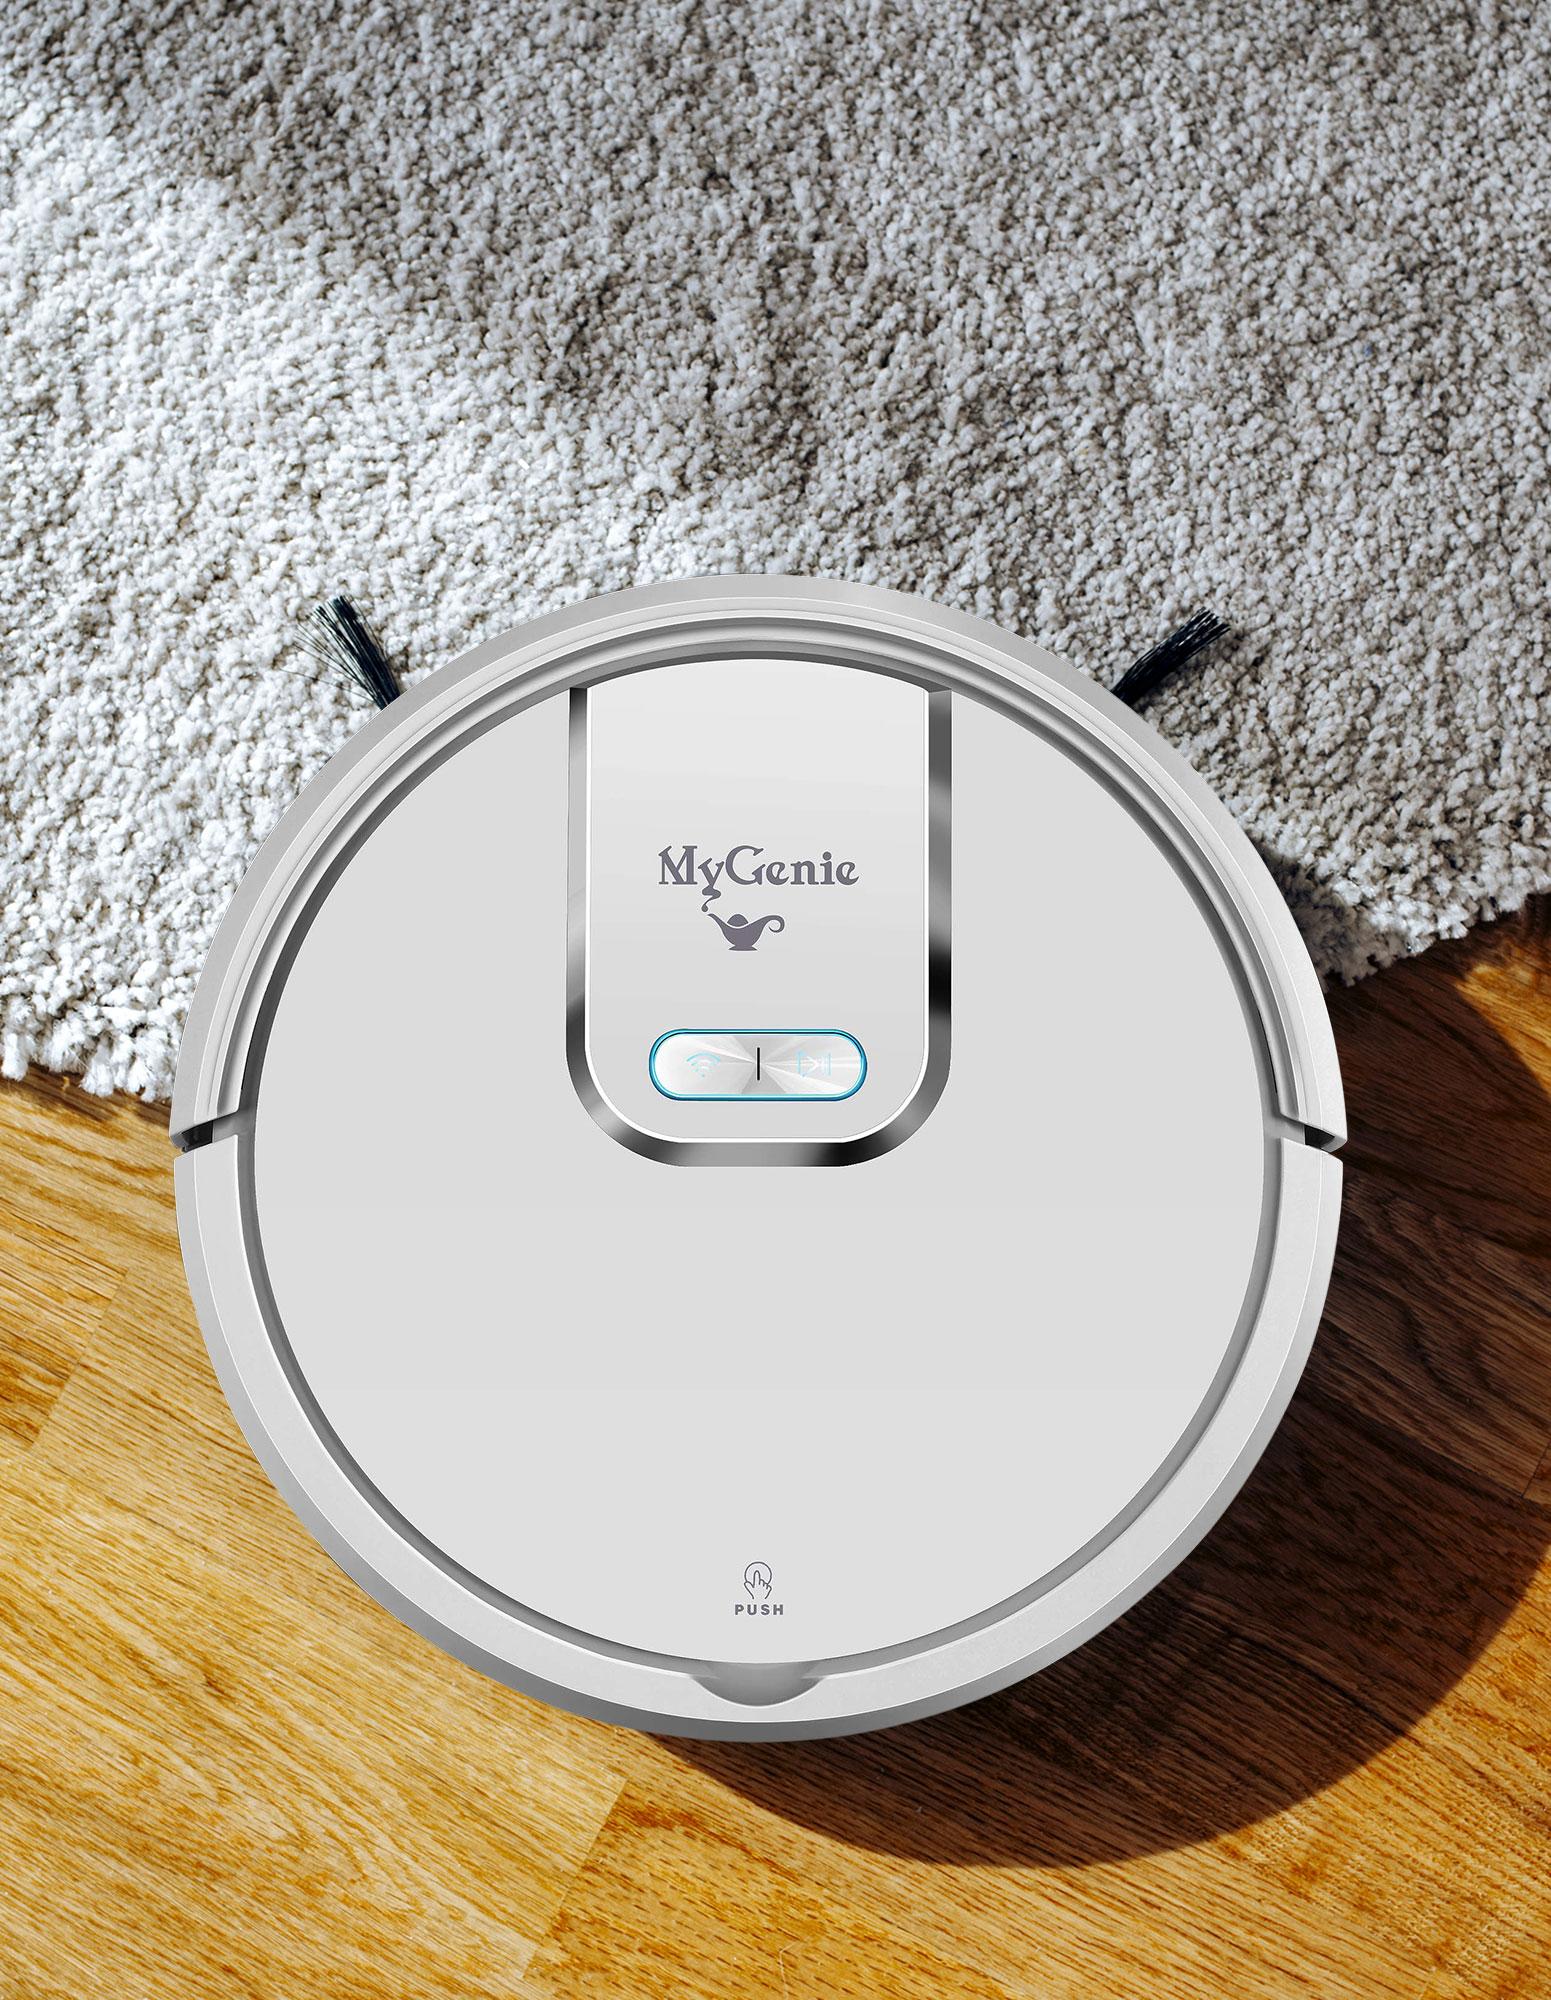 thumbnail 16 - MyGenie WI-FI GMAX Robotic Vacuum Cleaner Mop App Control Dry & Wet Auto Robot